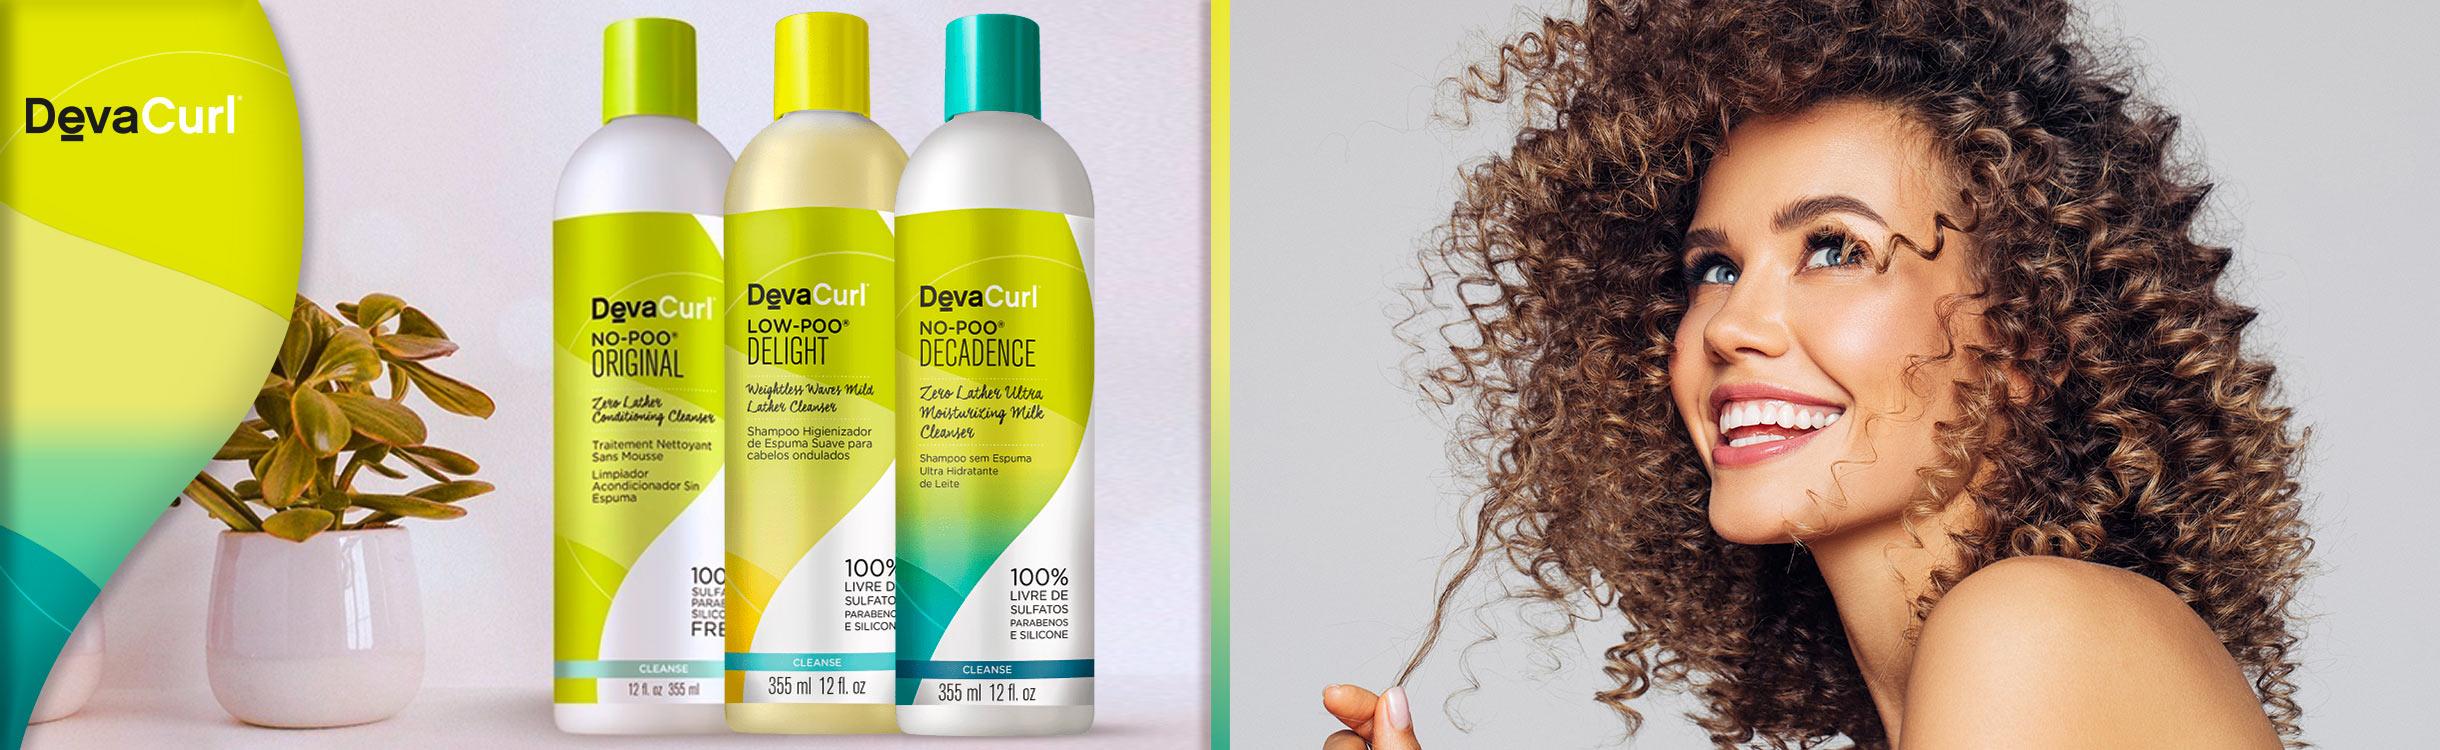 Shampoo Deva Curl